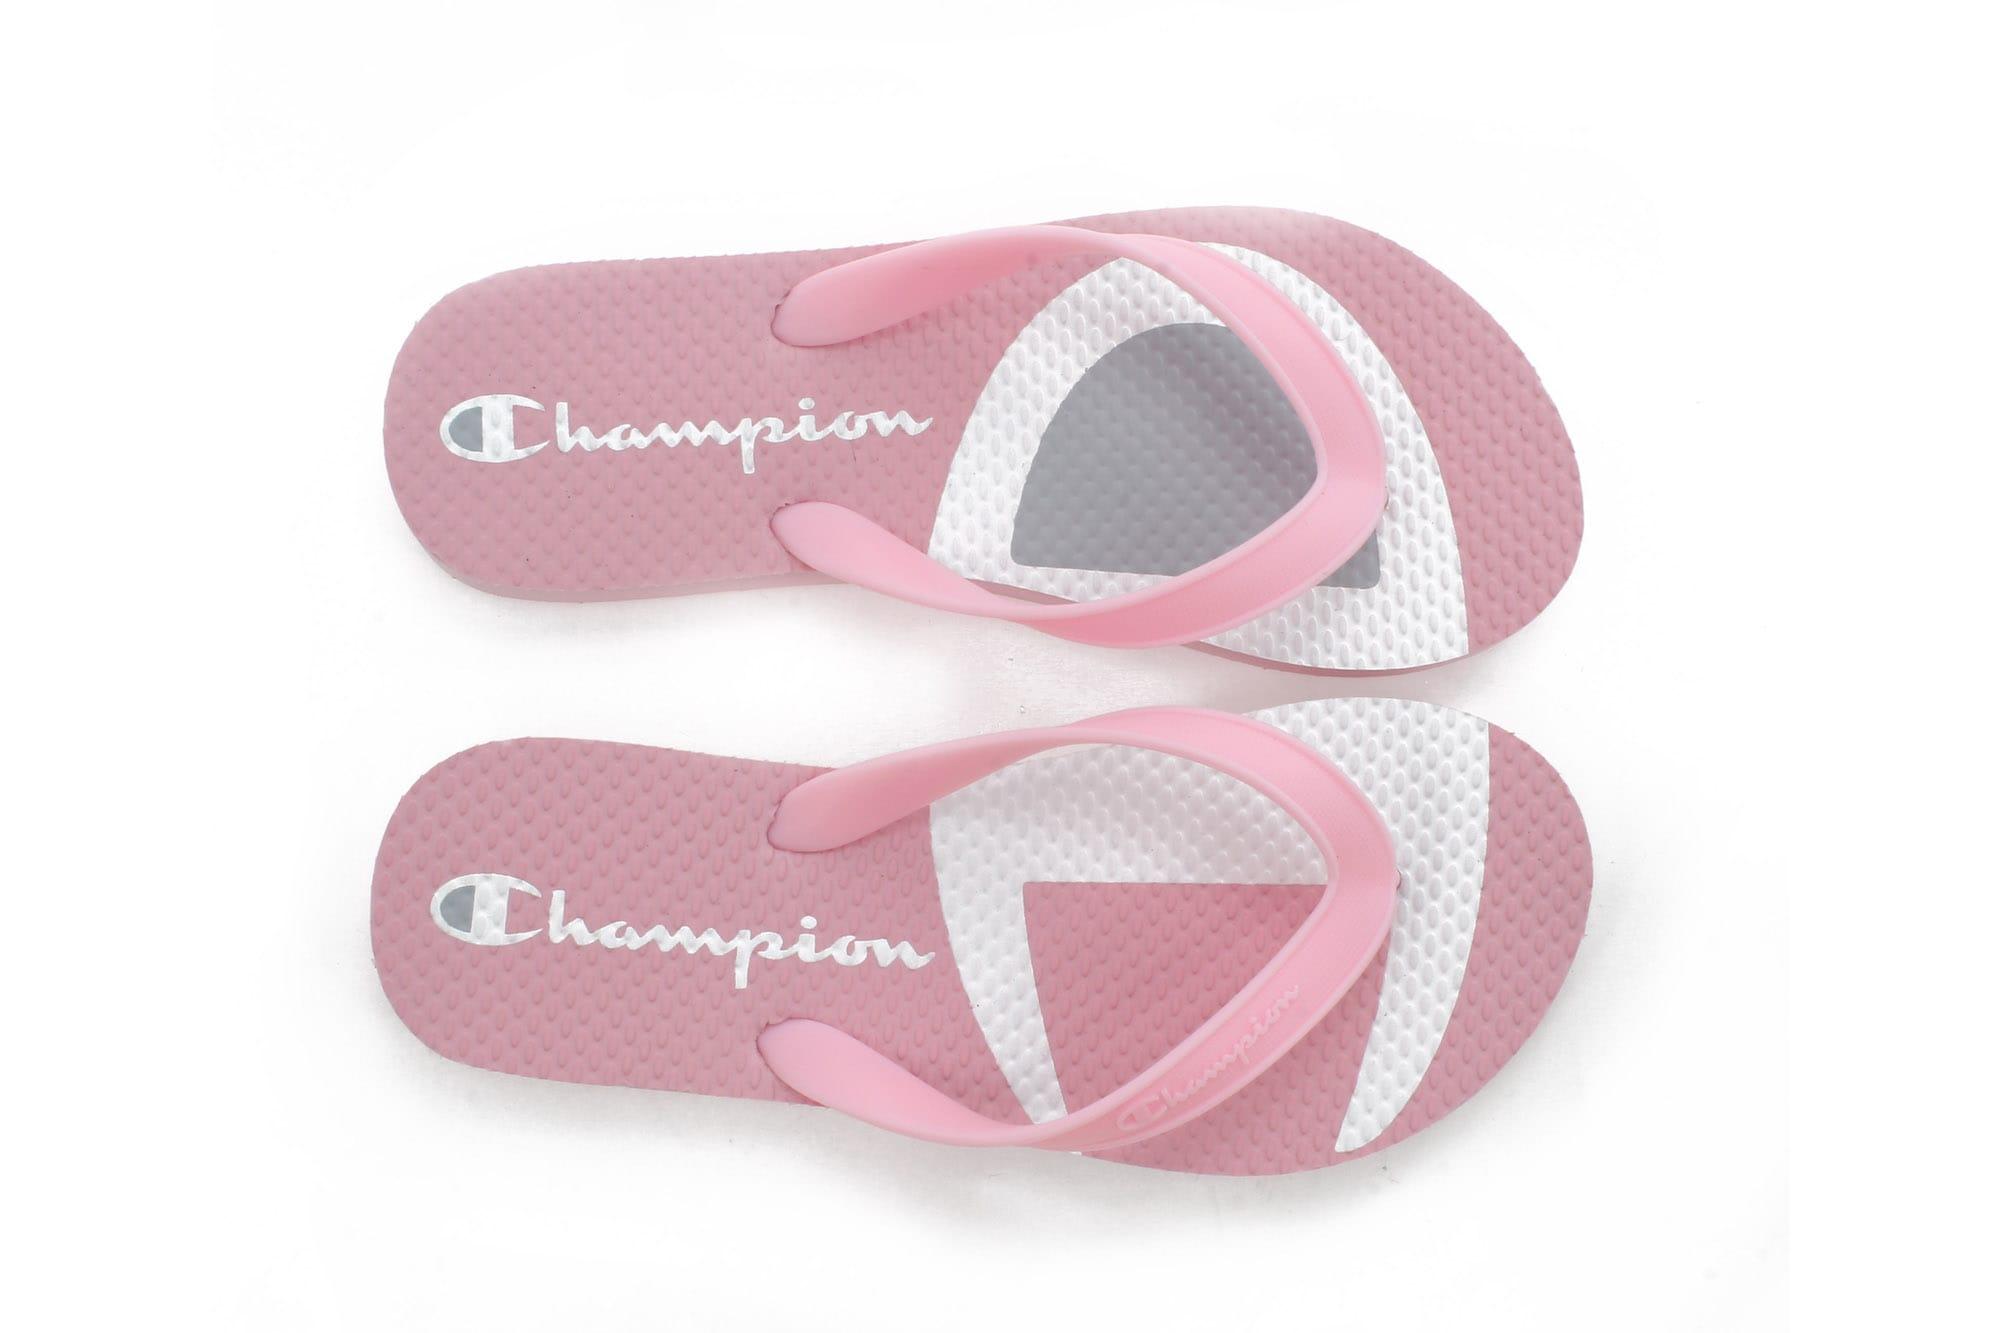 champion flip flops pink